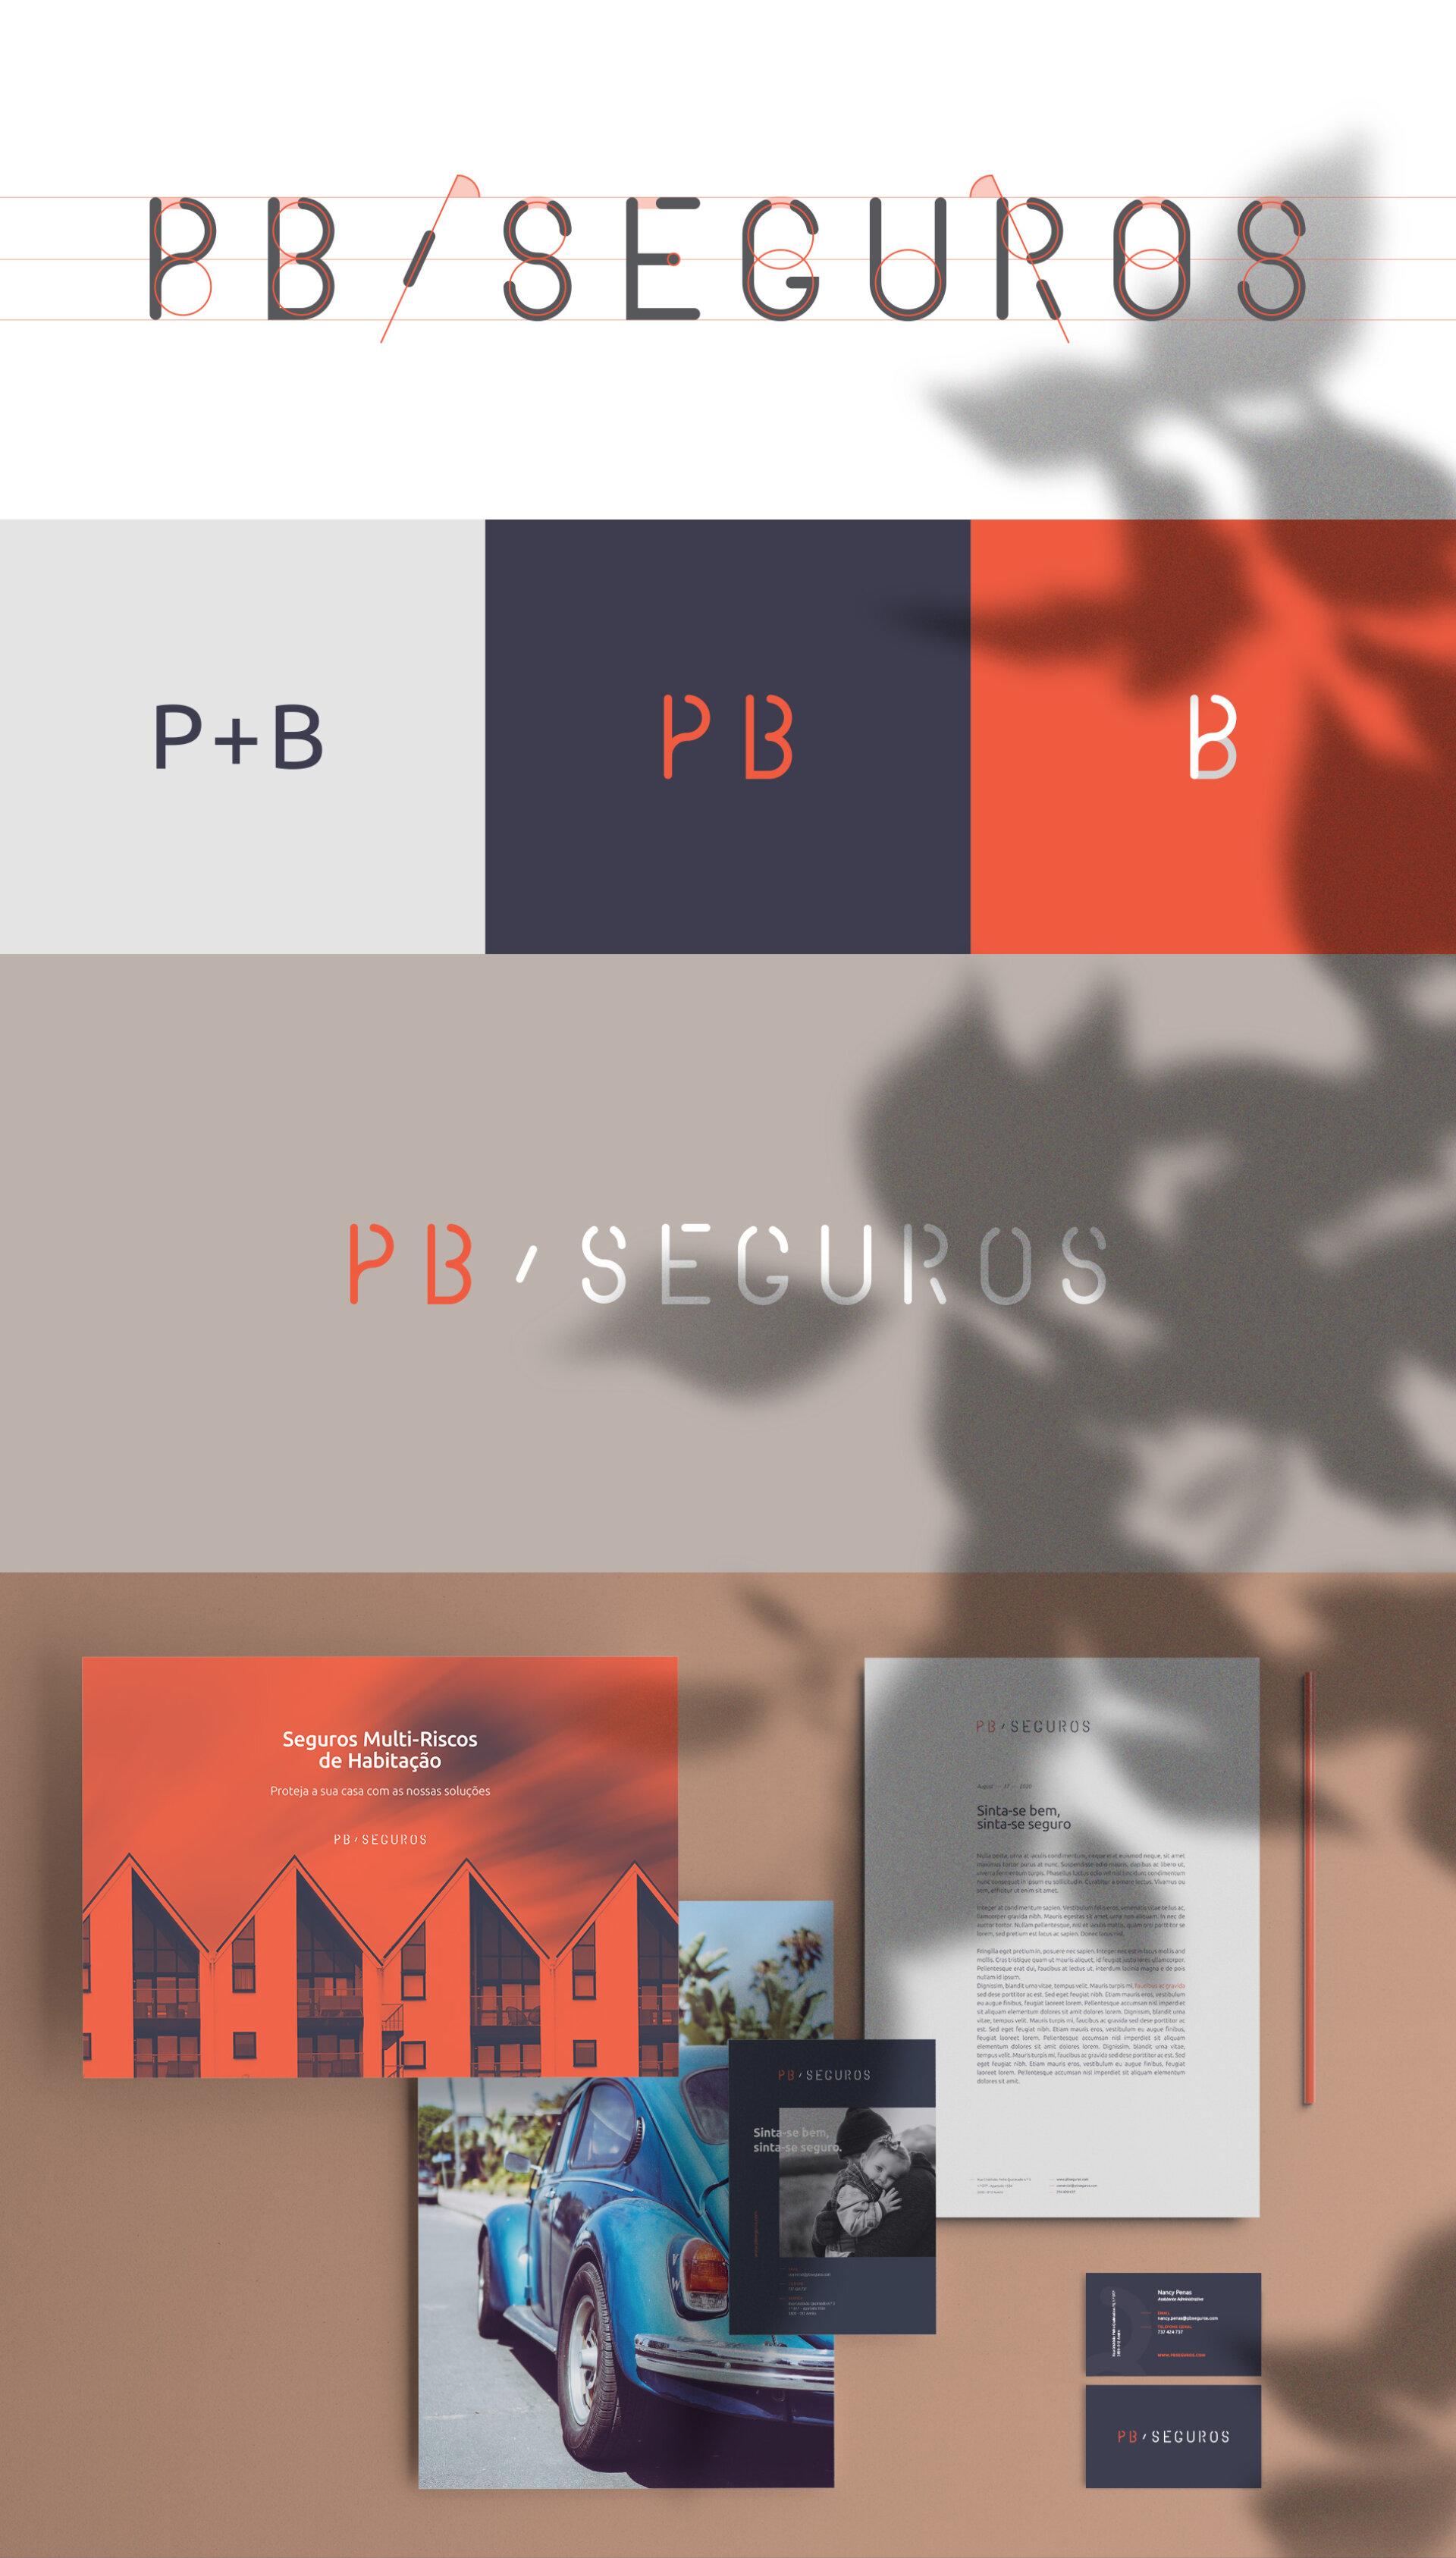 pb-seguros-logotipo-incentea-marketing-inovacao